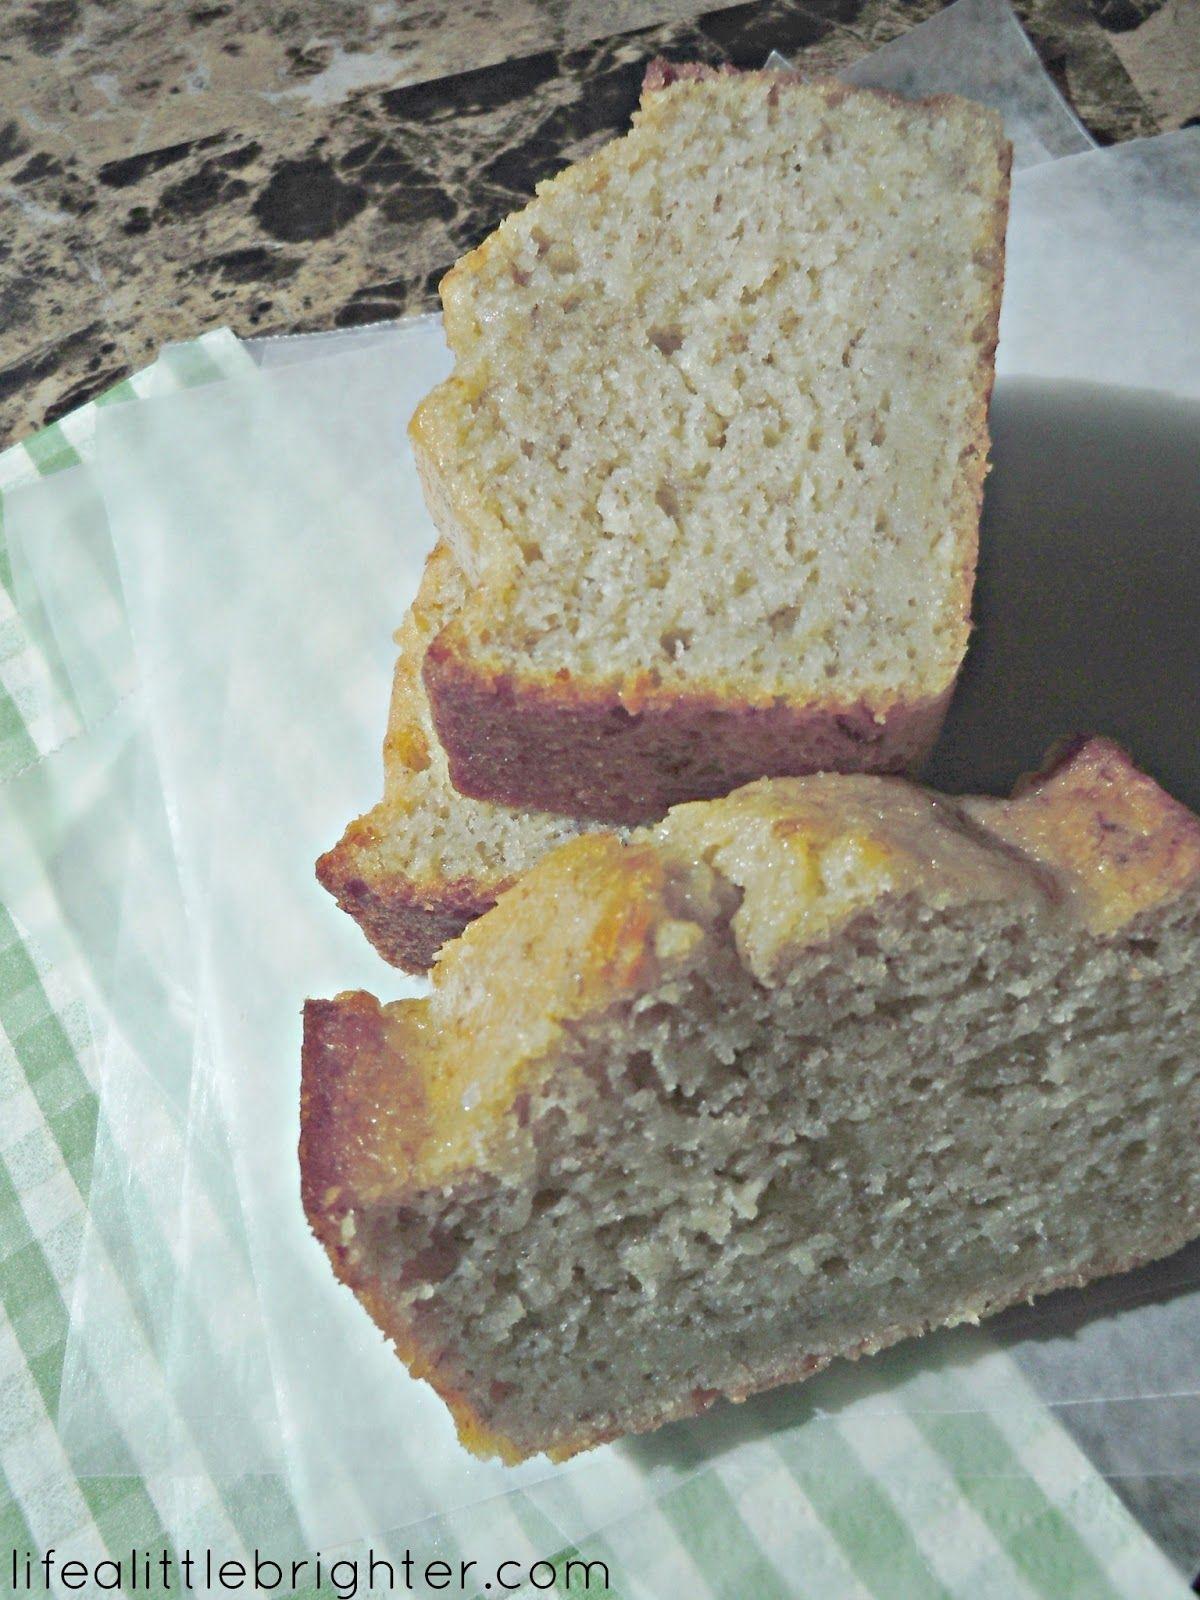 Life a Little Brighter: Sour Cream Banana Bread